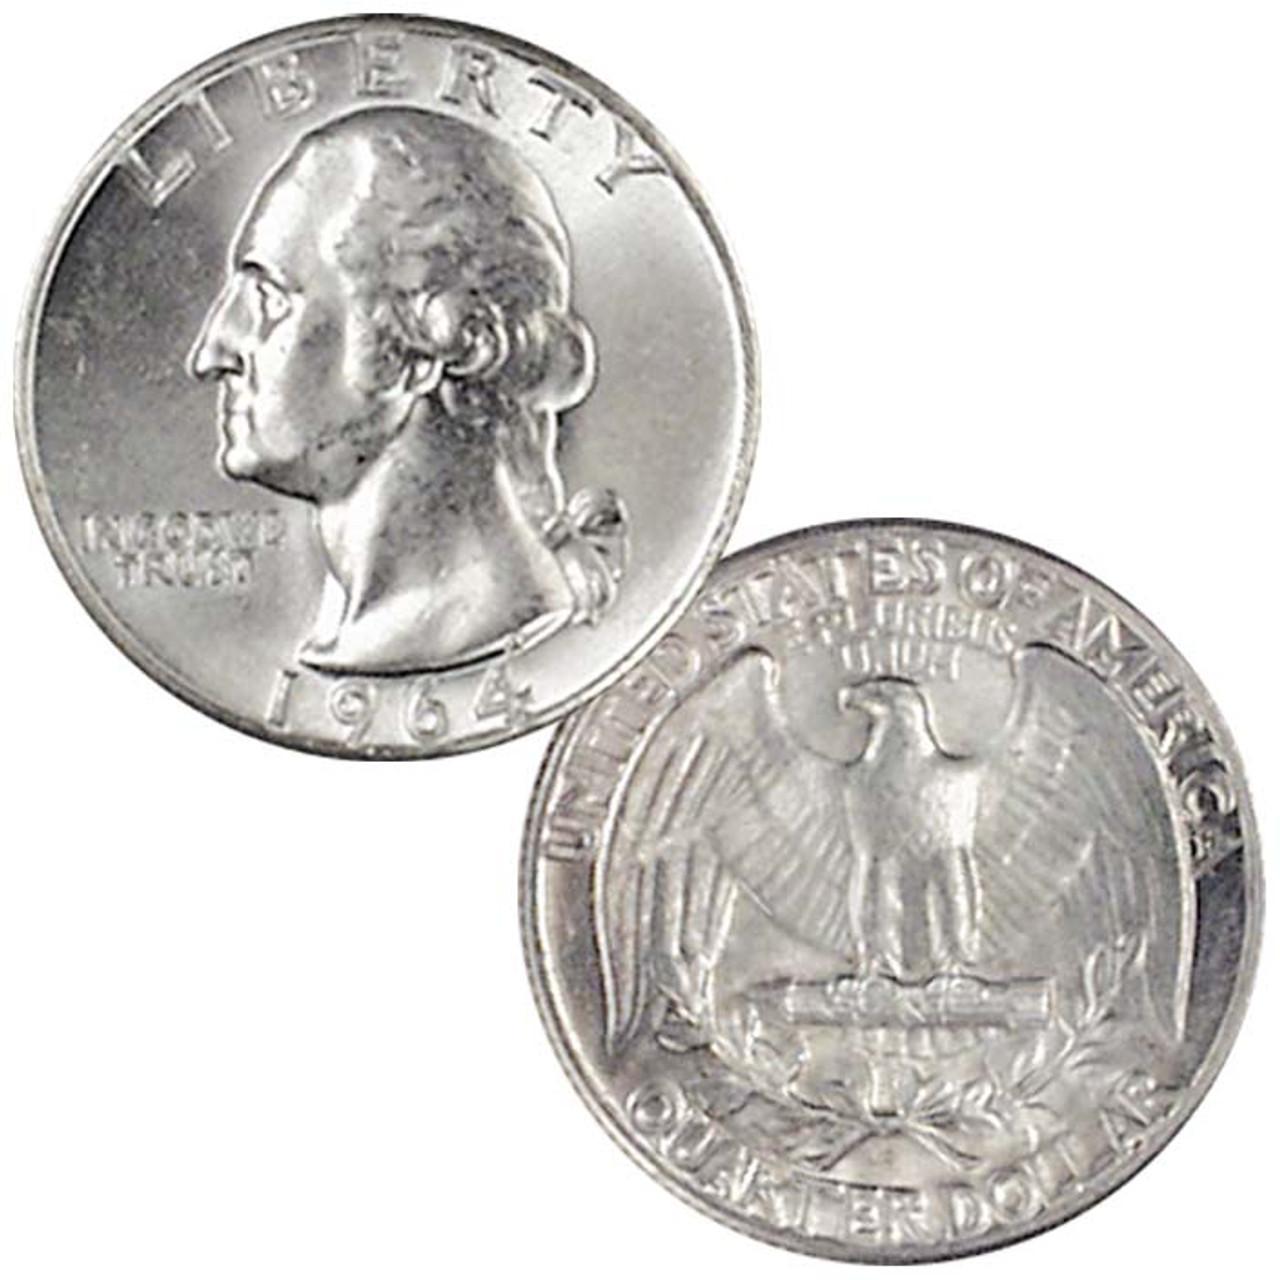 1964-P Washington Silver Quarter Brilliant Uncirculated Image 1